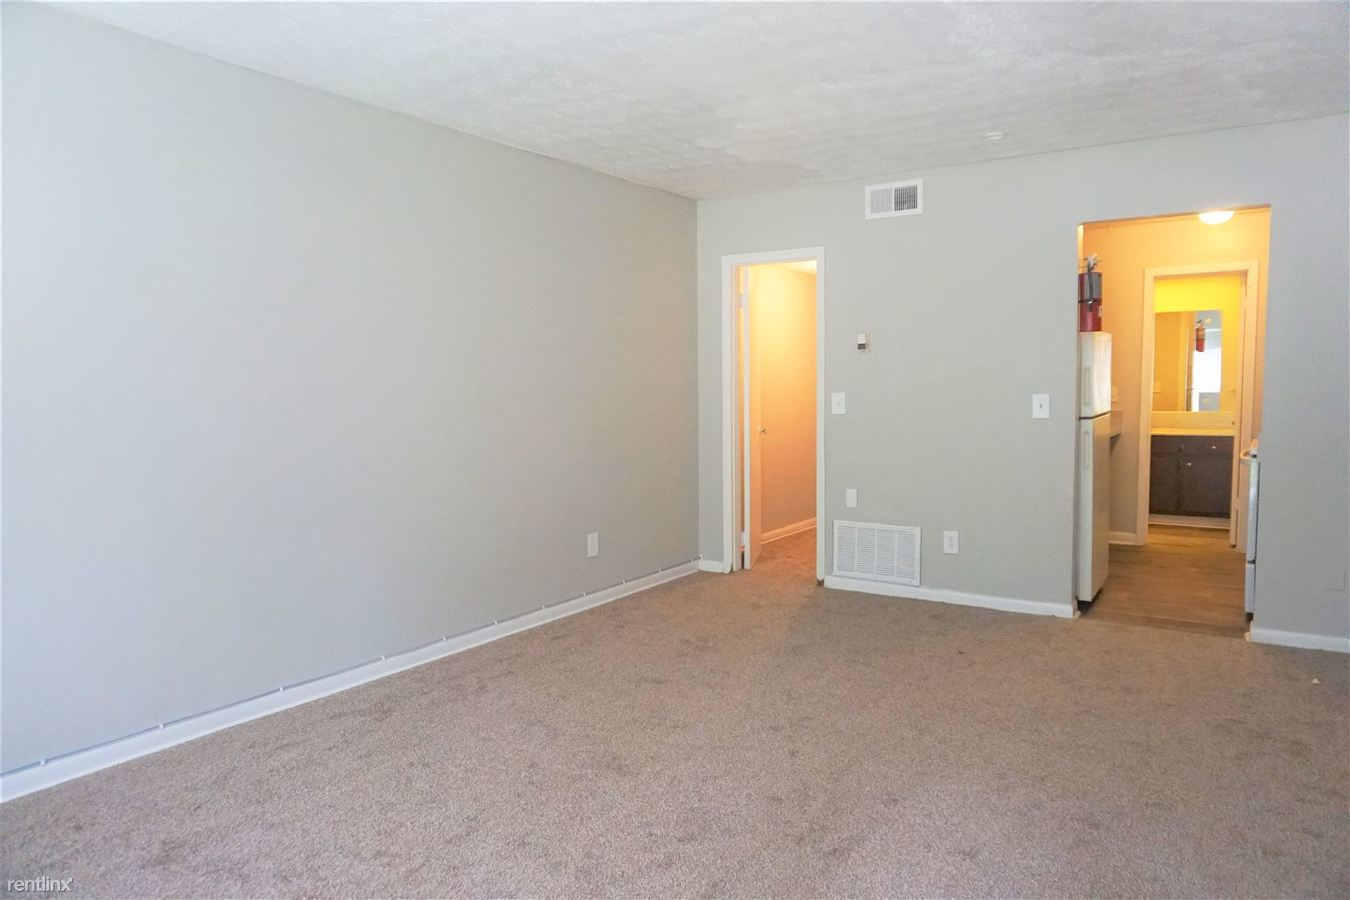 Studio 1 Bathroom Apartment for rent at Balfour Chastain in Atlanta, GA